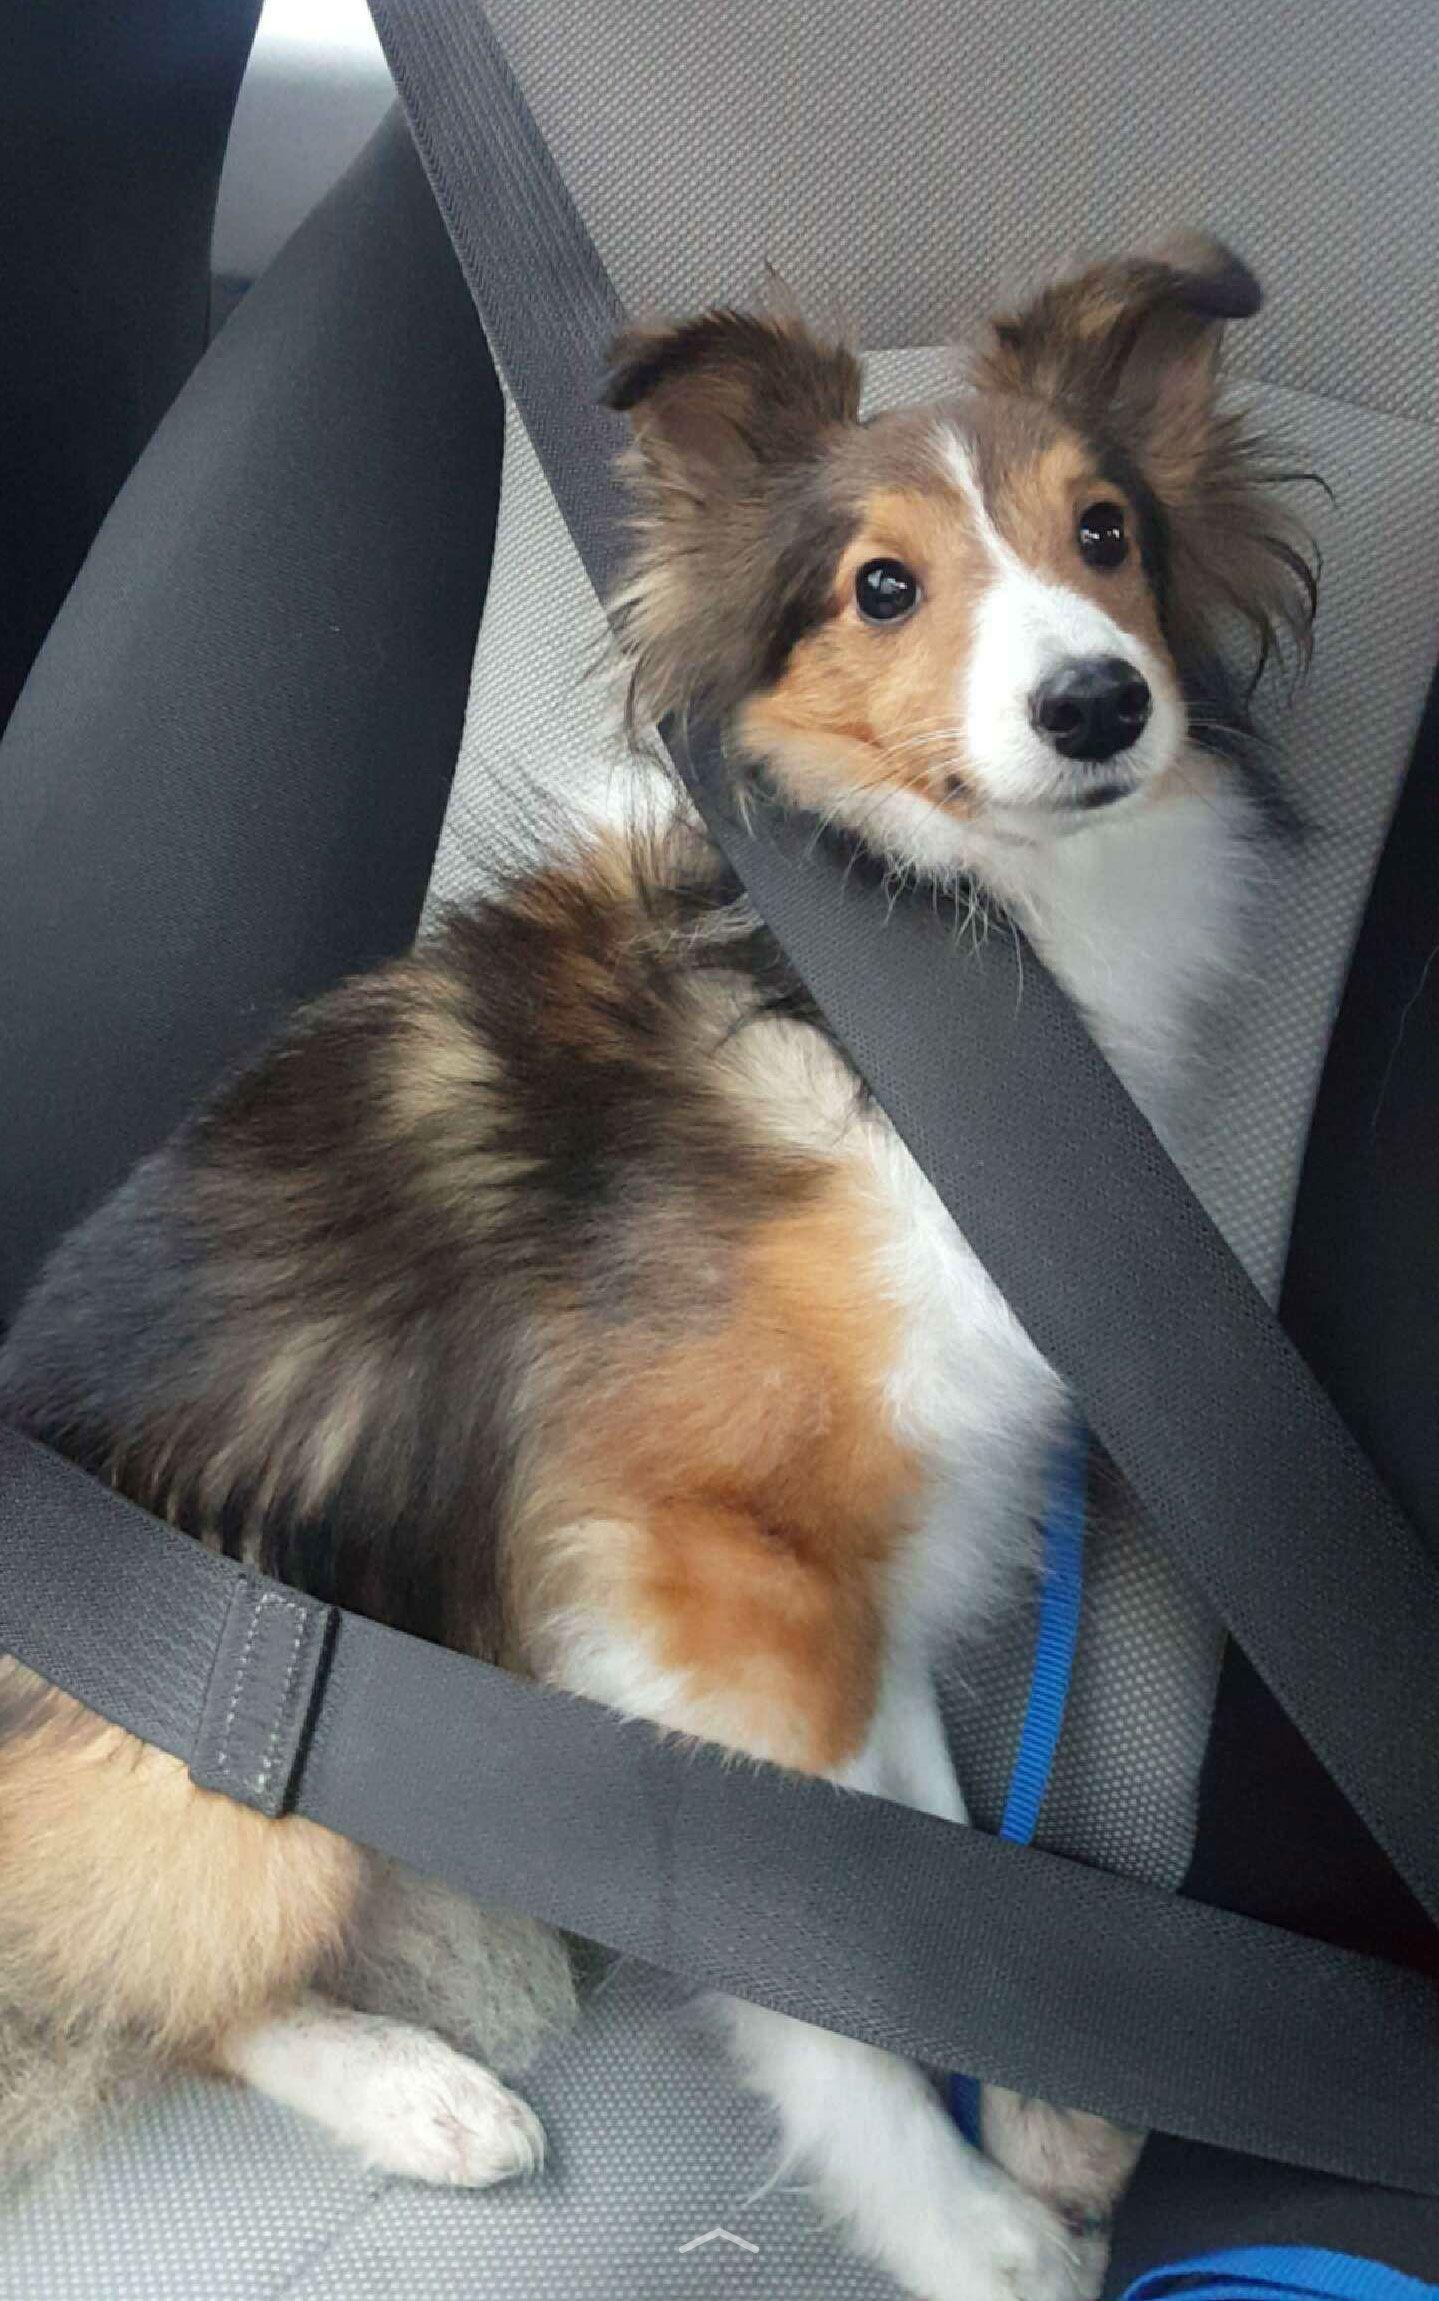 Too Cute To Be Real Shetland Sheepdog in the Car